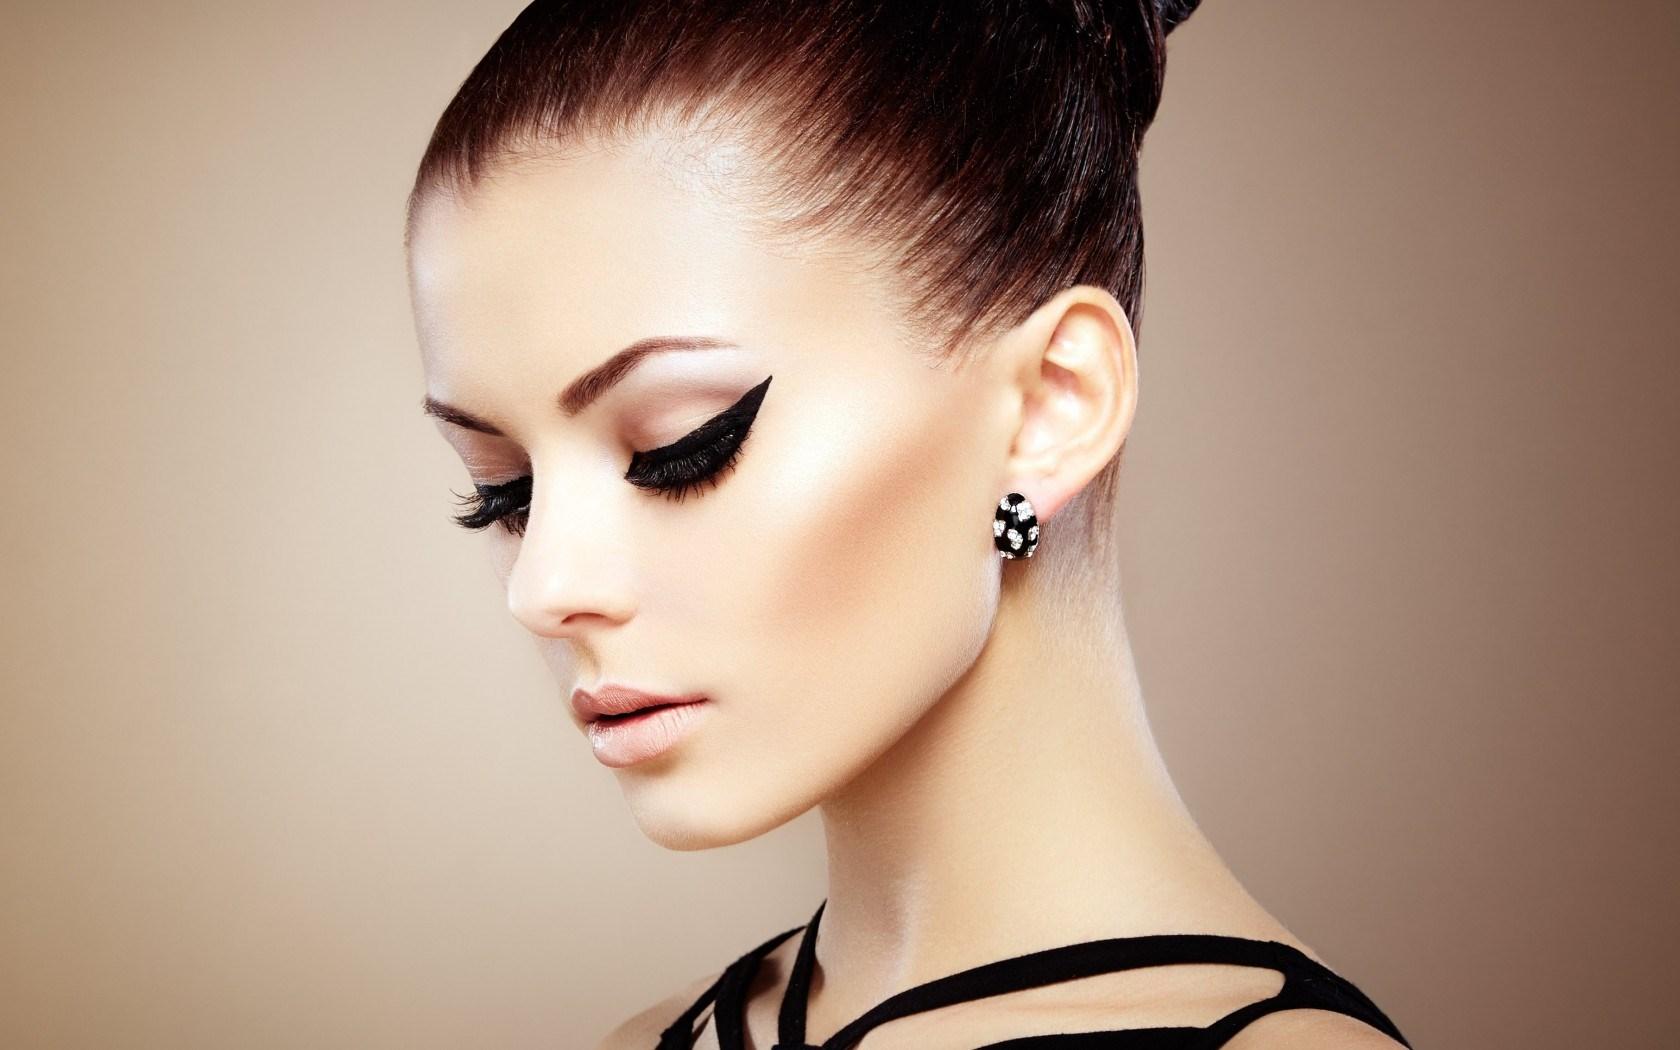 Model makeup hd wallpaper free high definition wallpapers - Beautiful model wallpaper ...